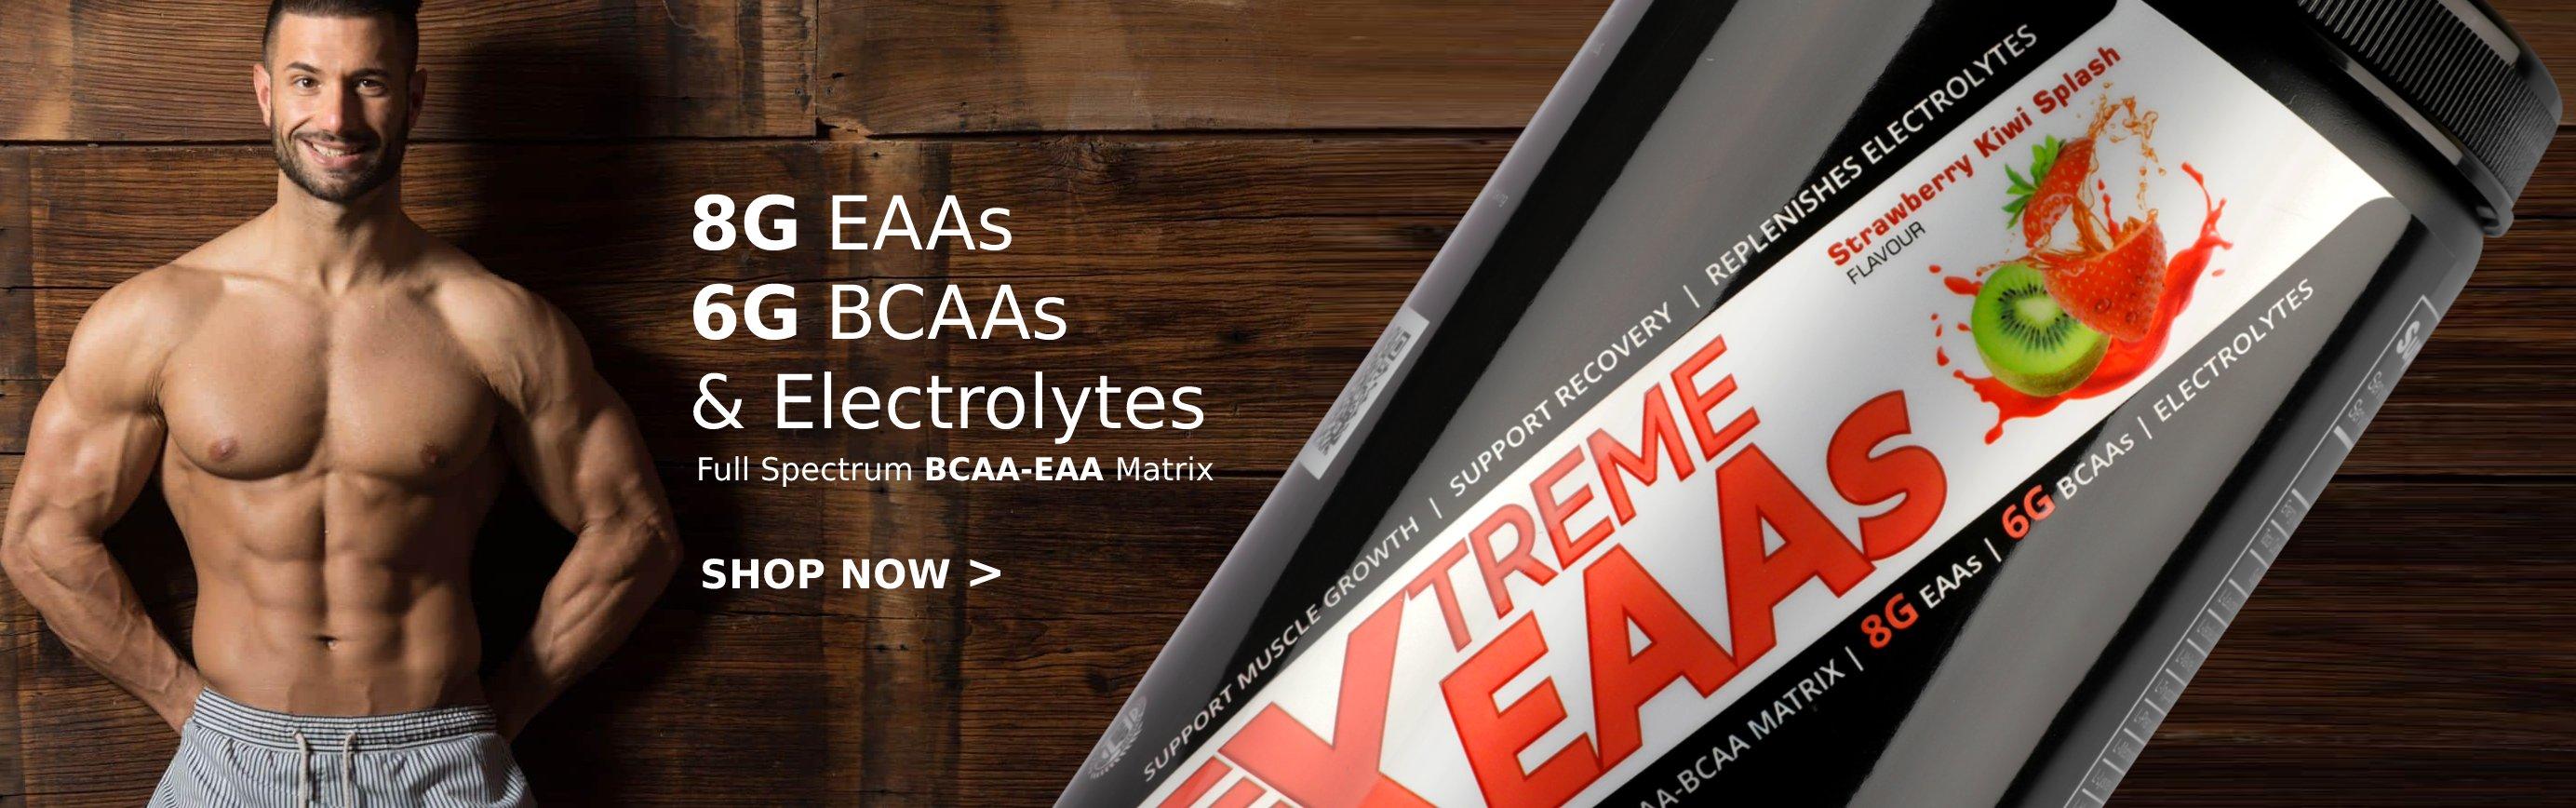 Xtreme EAA Banner